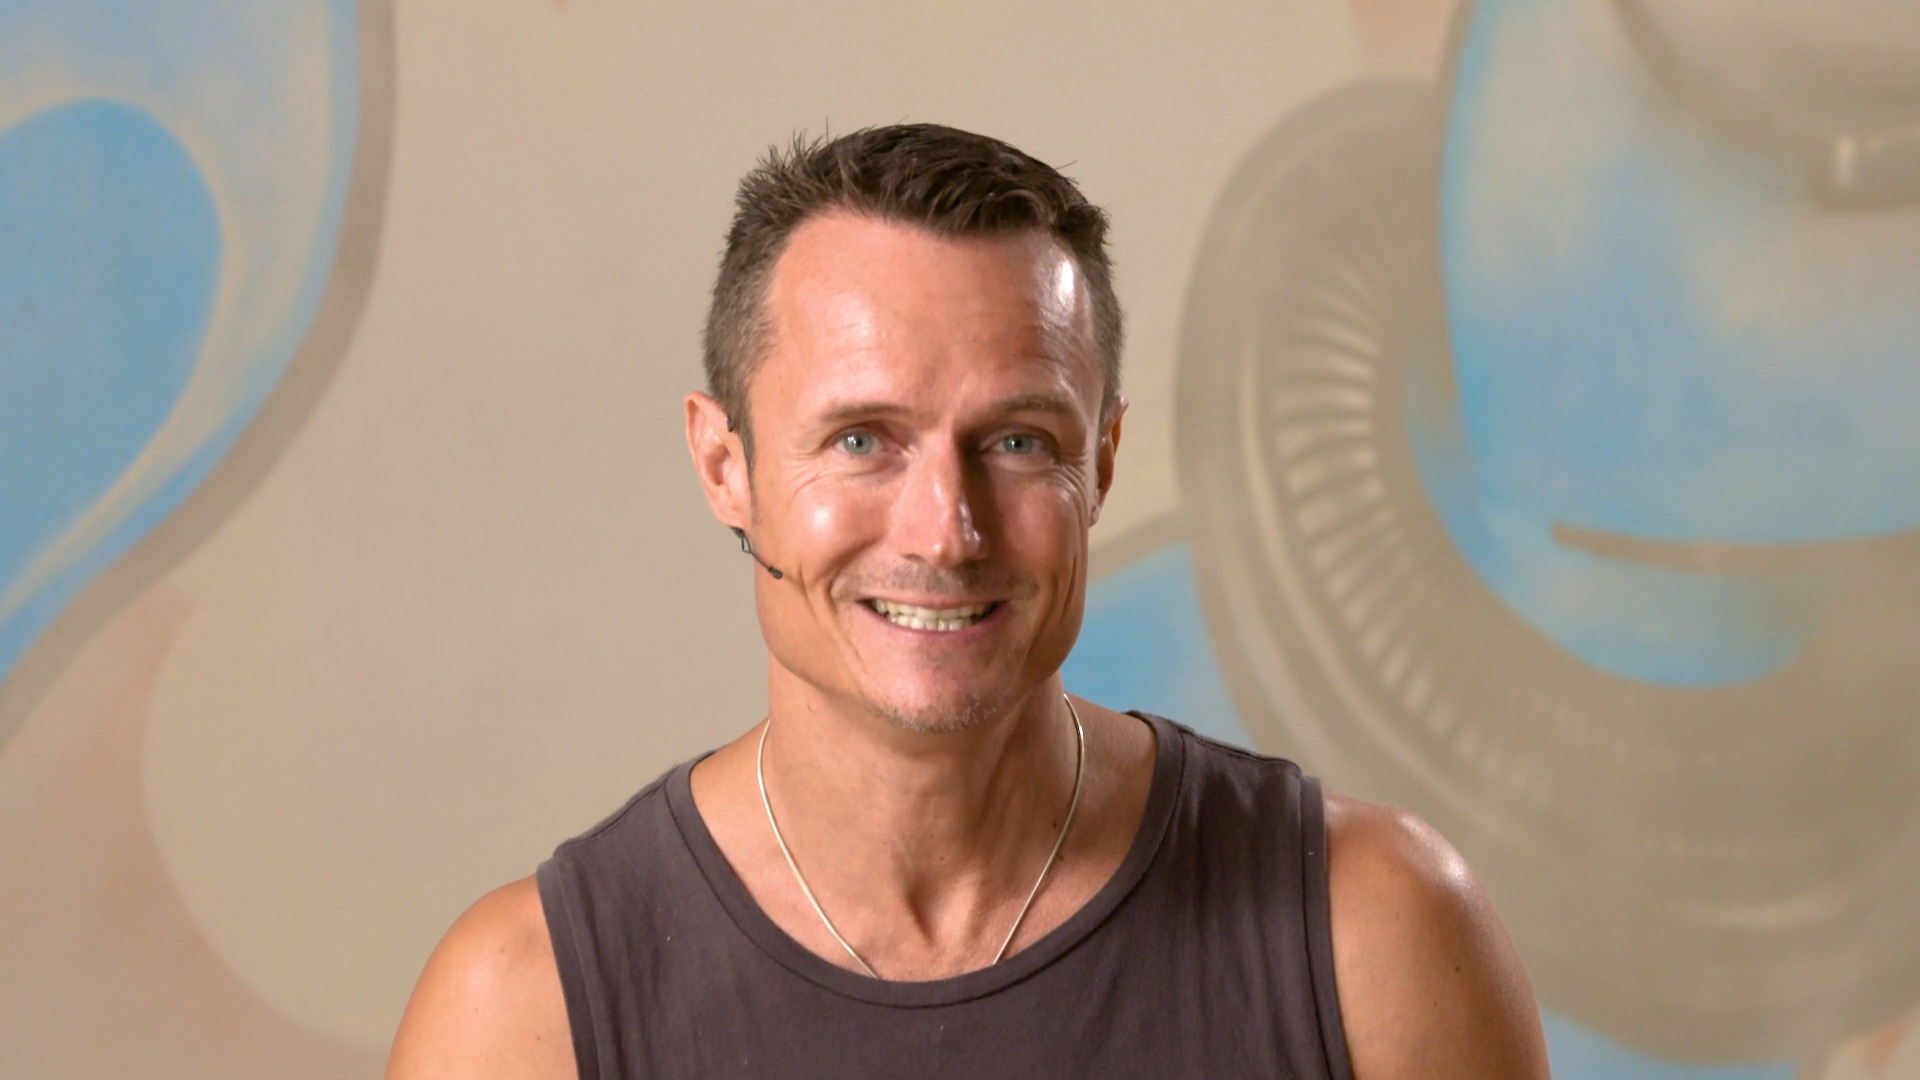 Maitri keenan crisp yogaholics power living australia yoga online yoga